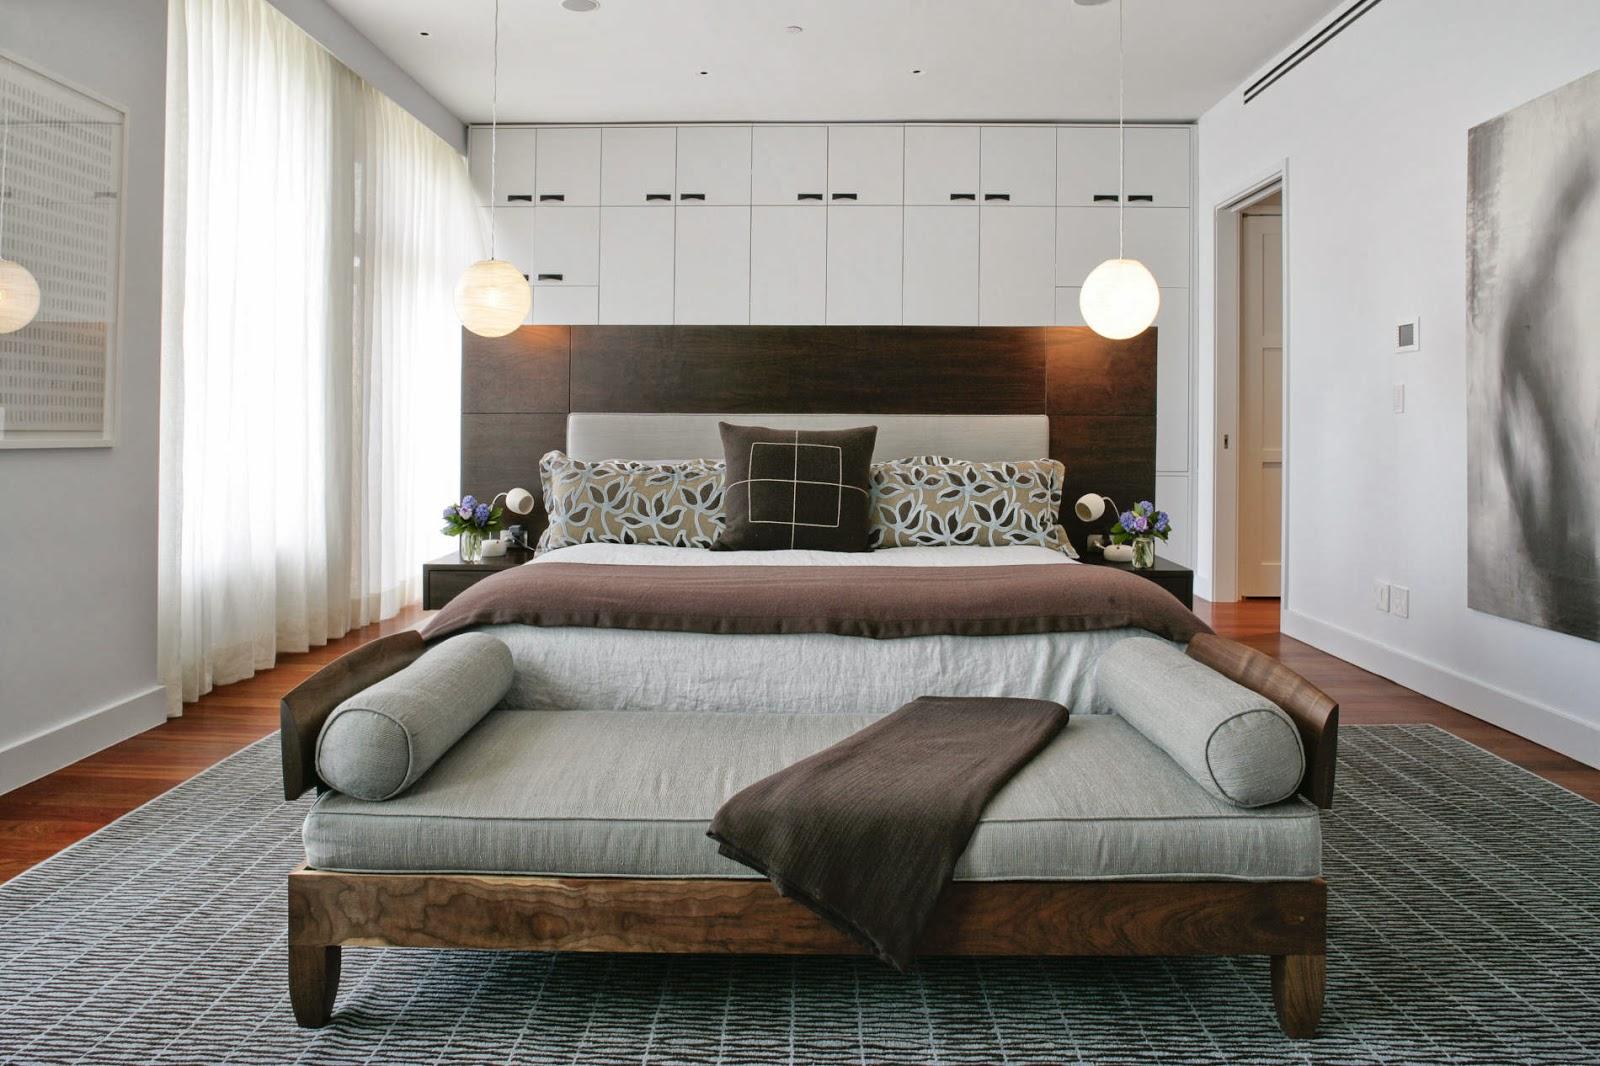 Bedroom Color Ideas Relaxing